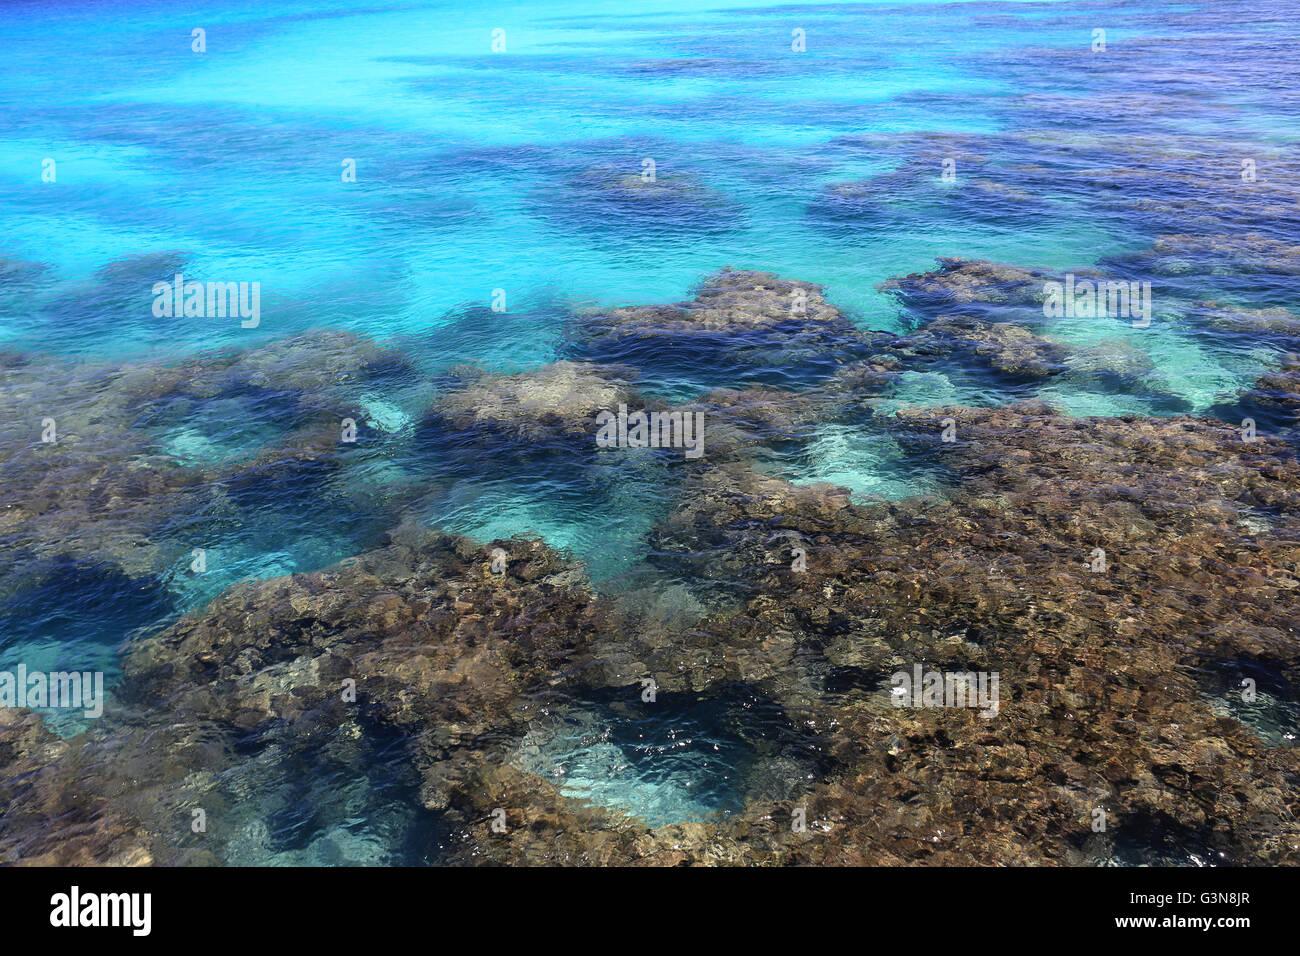 Coral reef in clear ocean water, Christmas Island, Kiribati Stock Photo